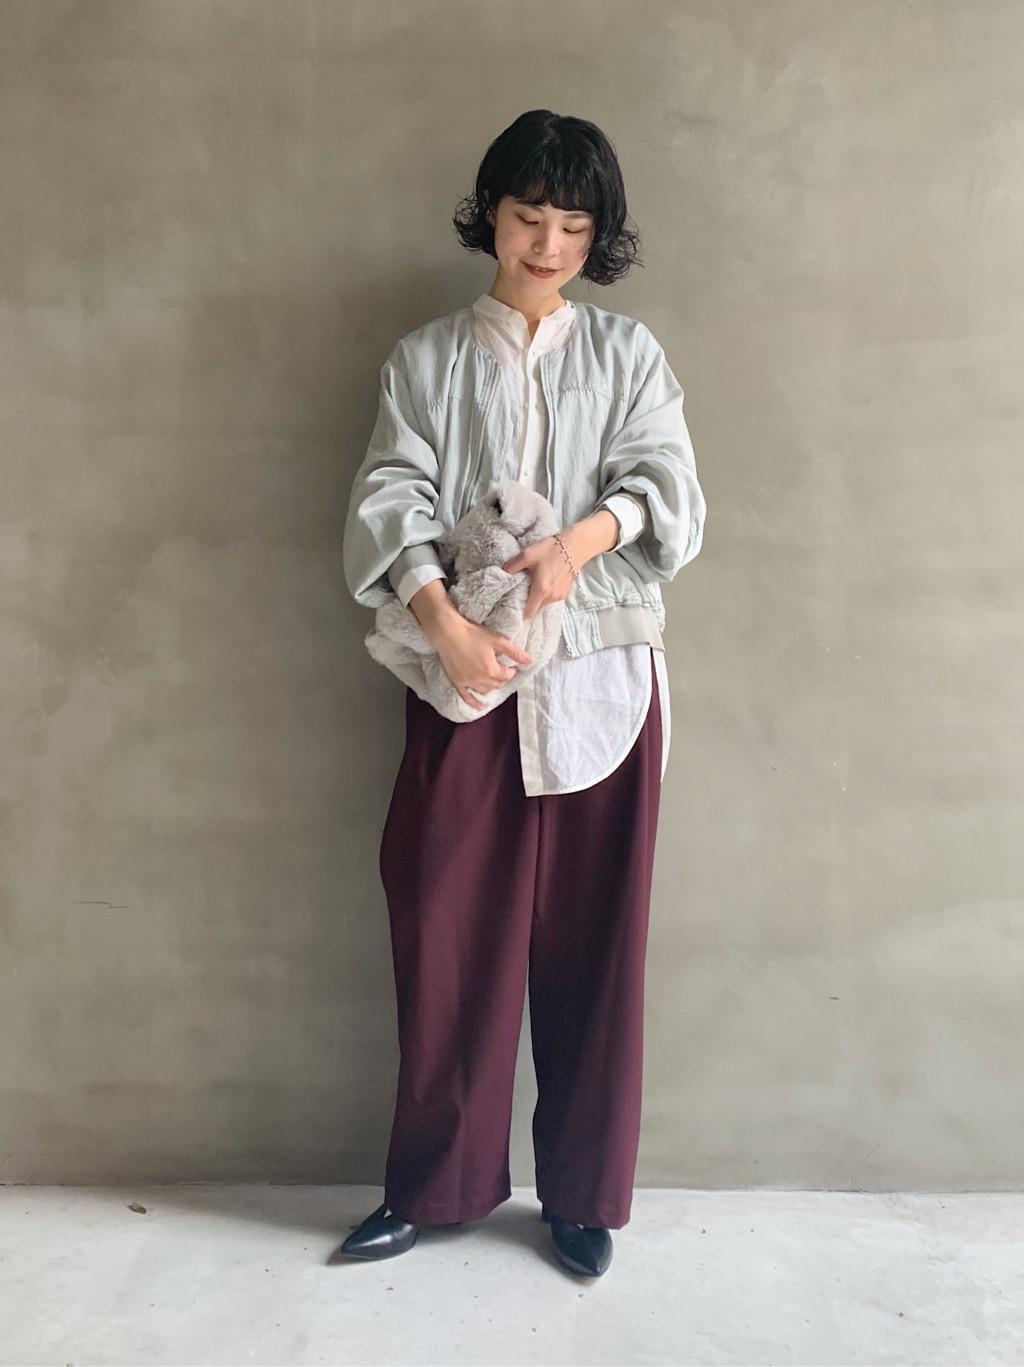 caph troupe 福岡薬院路面 身長:155cm 2020.11.16